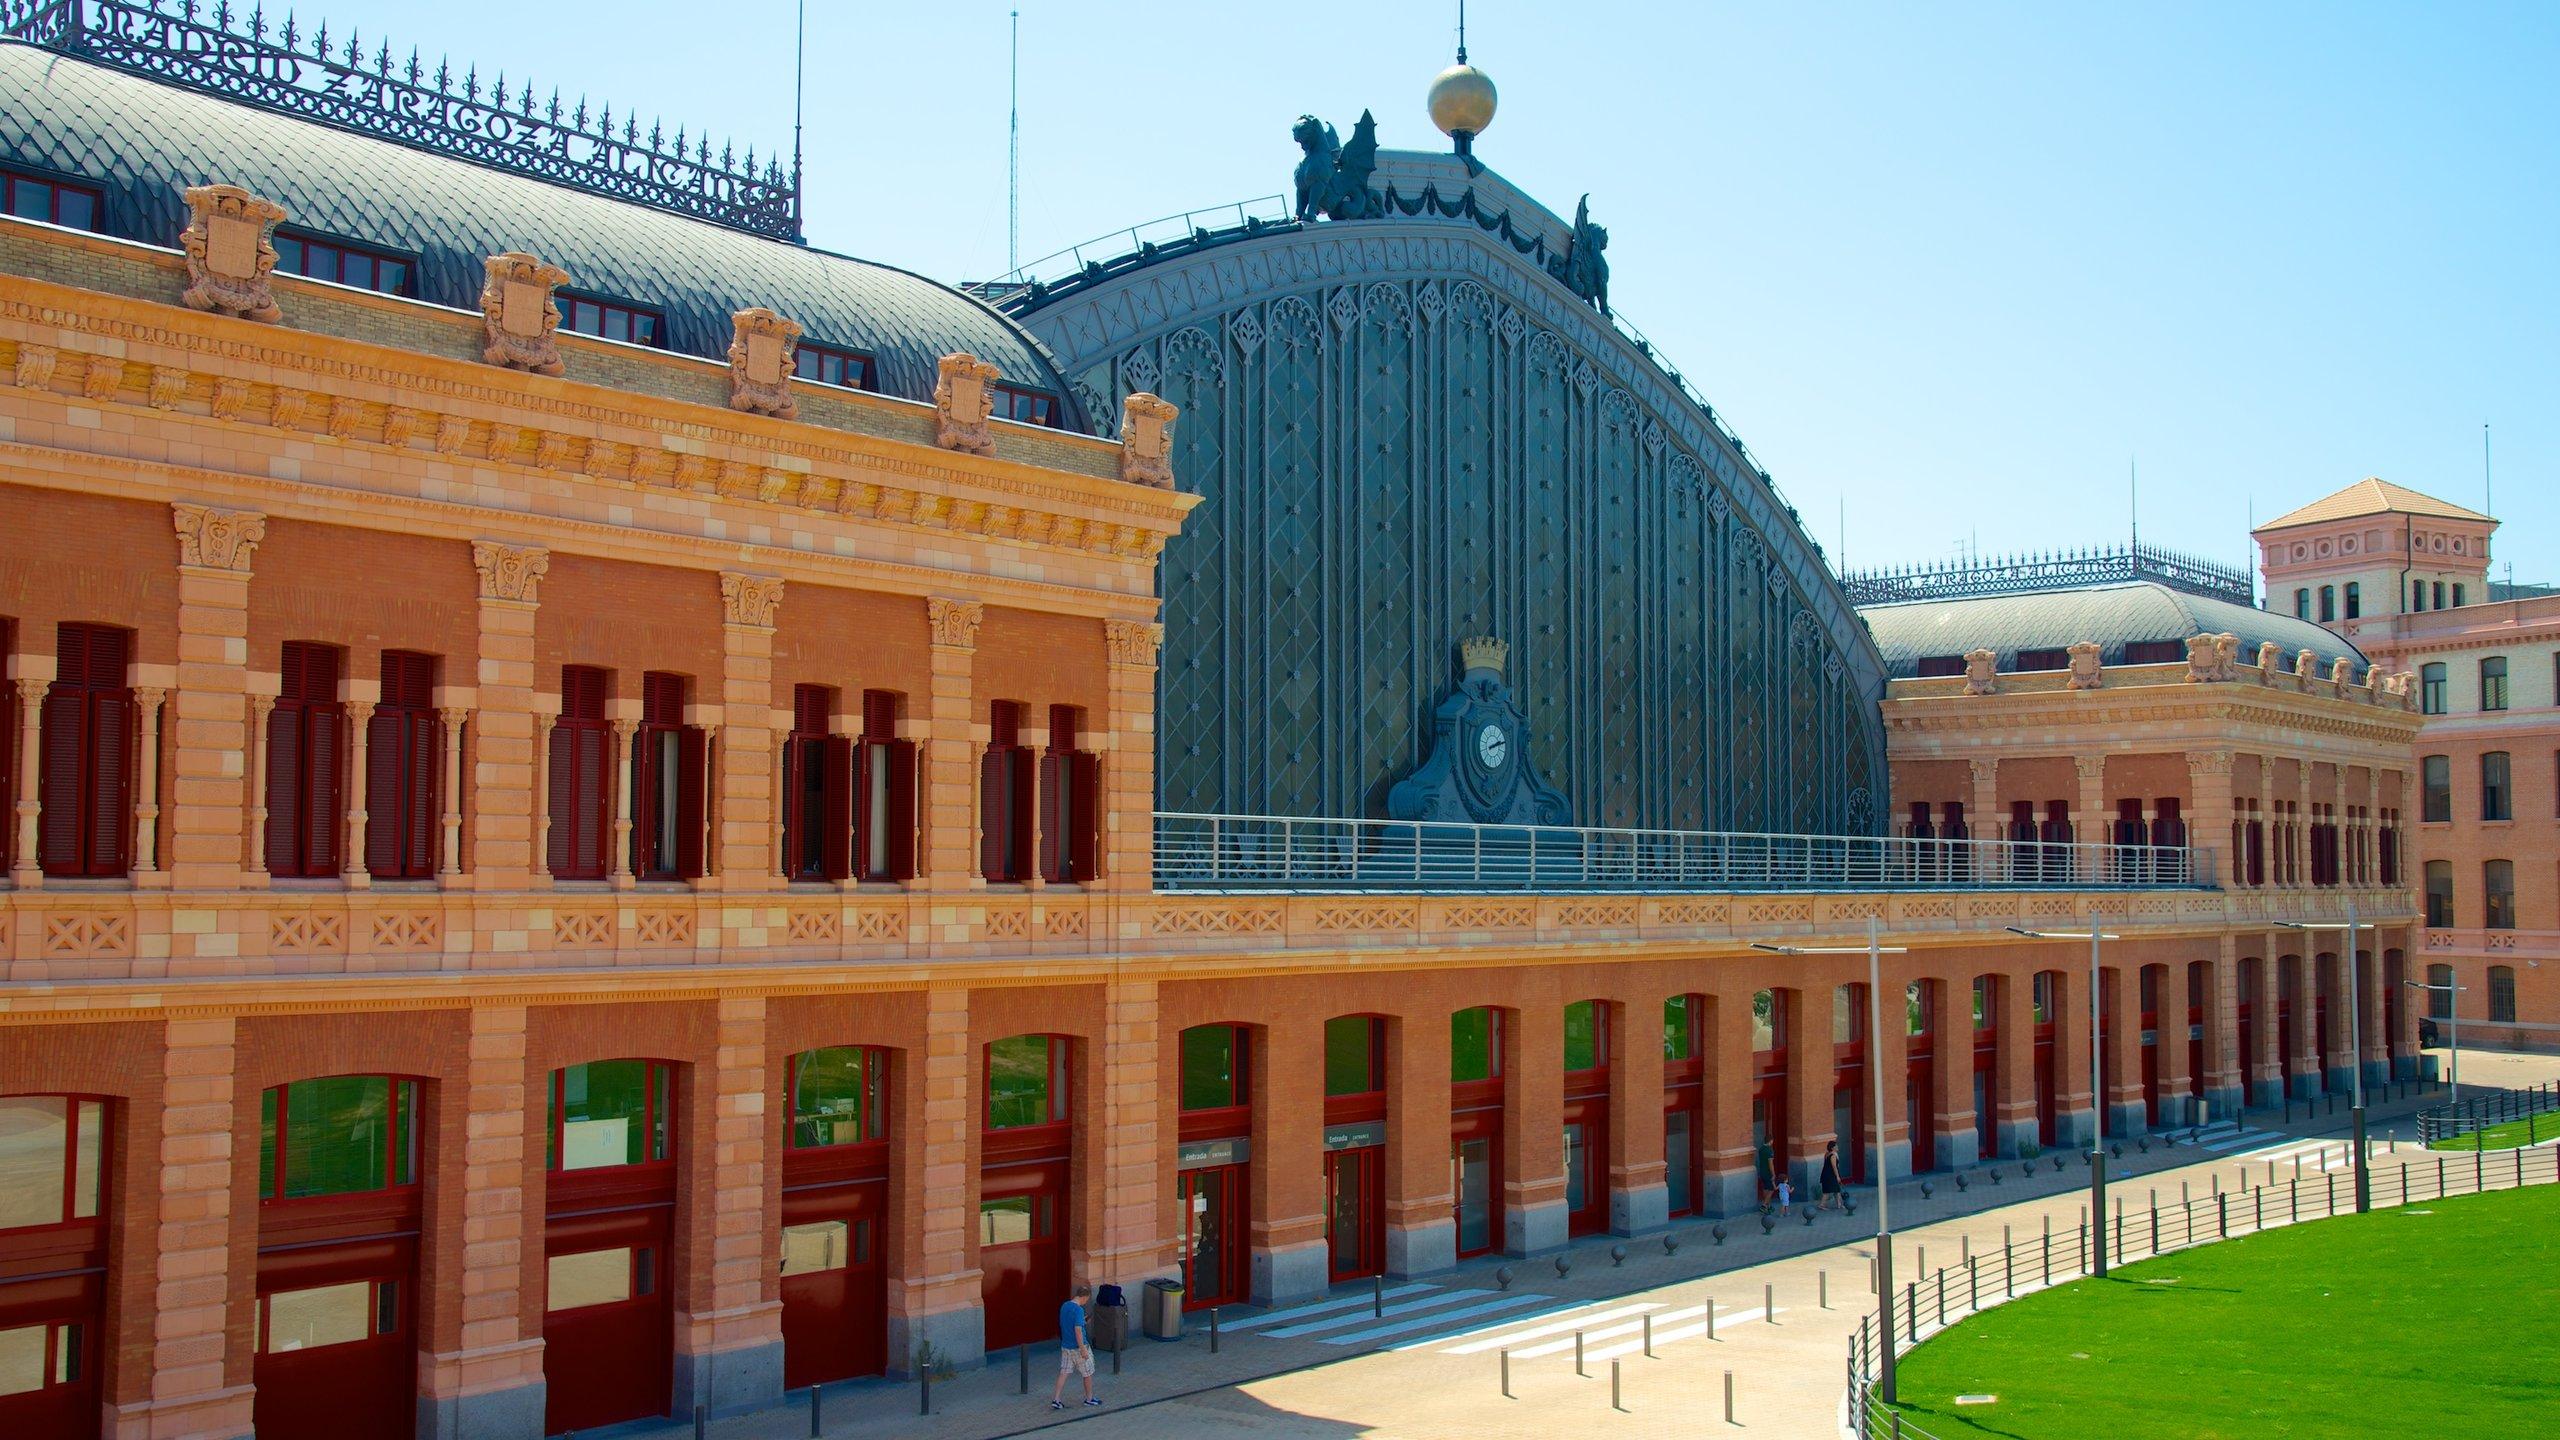 Madrid, Spain (XOC-Atocha Train Station)